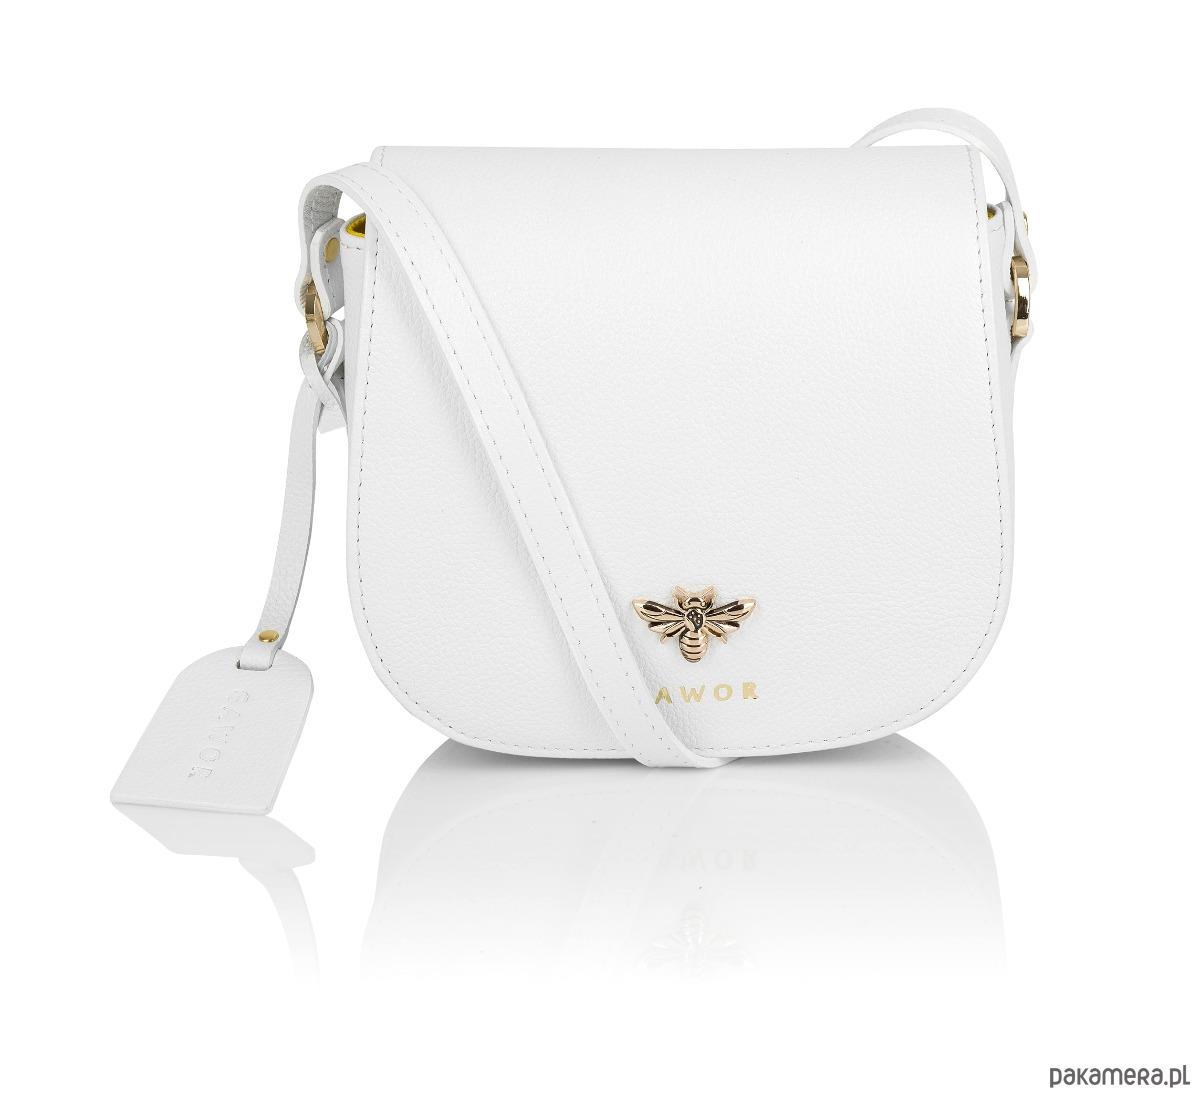 f76b2423e4e71 Skórzana biała listonoszka złote dodatki - torebki mini - Pakamera.pl